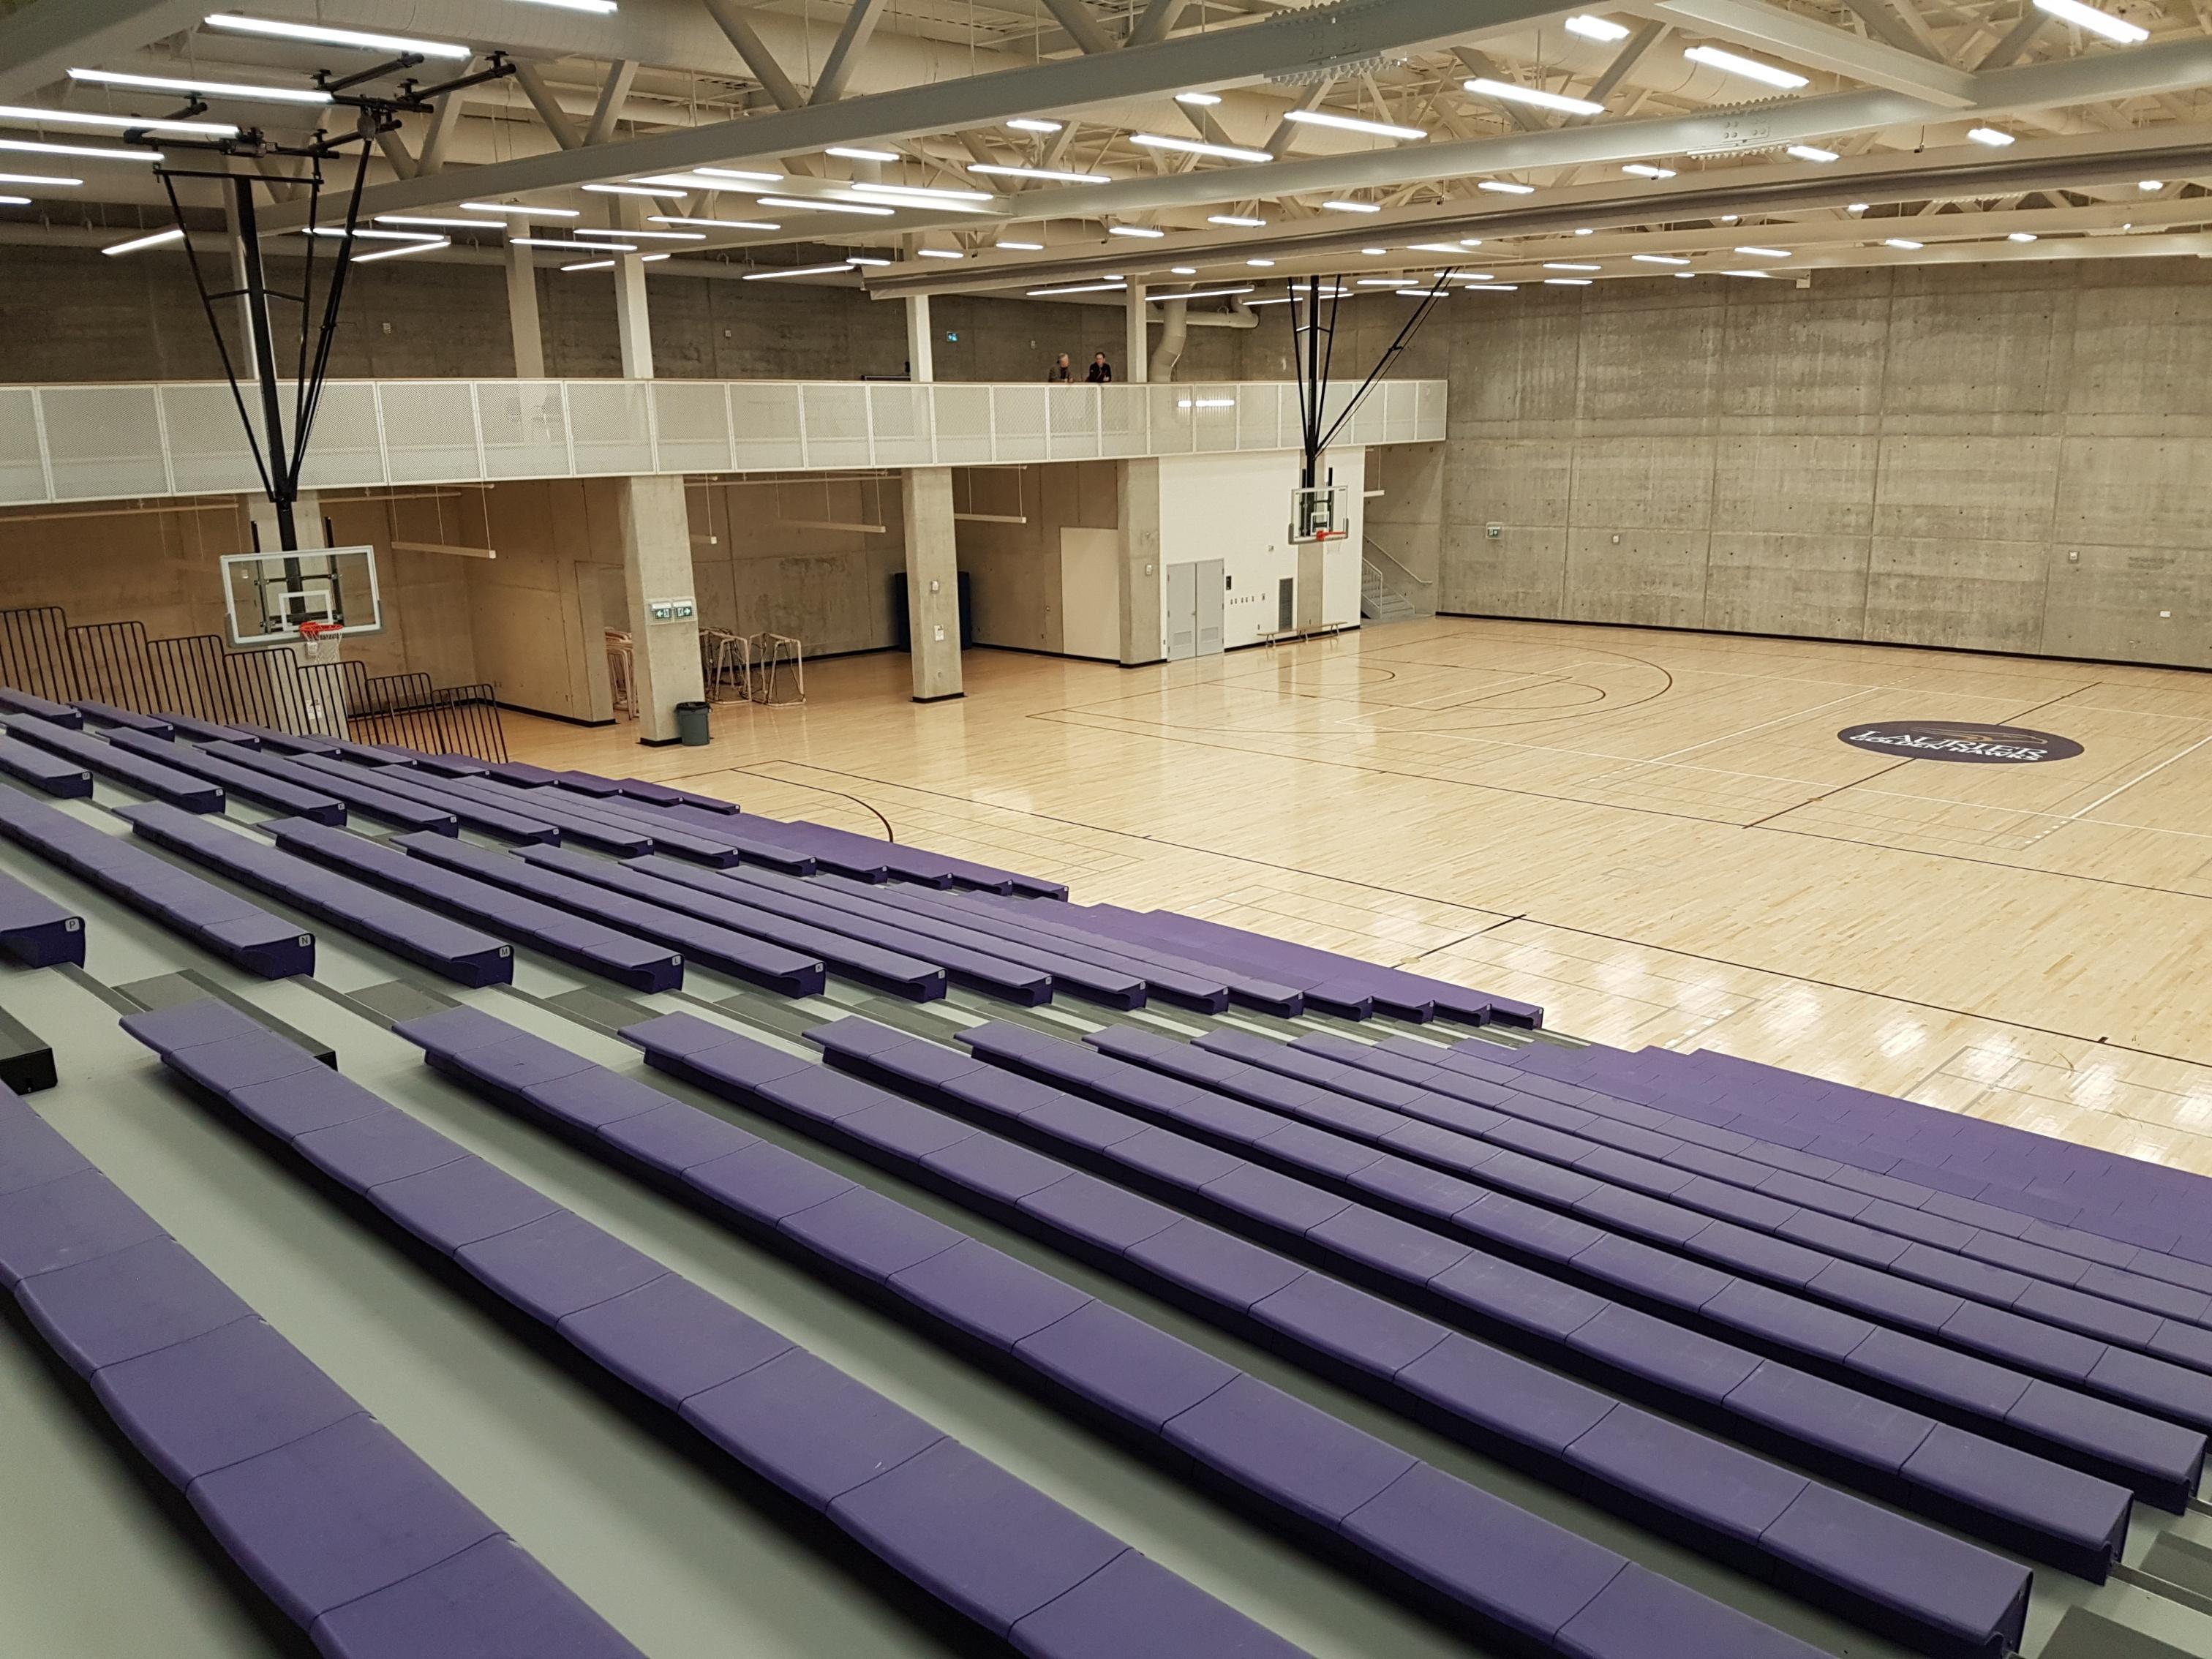 Building Sport Events Amp Facilities Forum Athletic